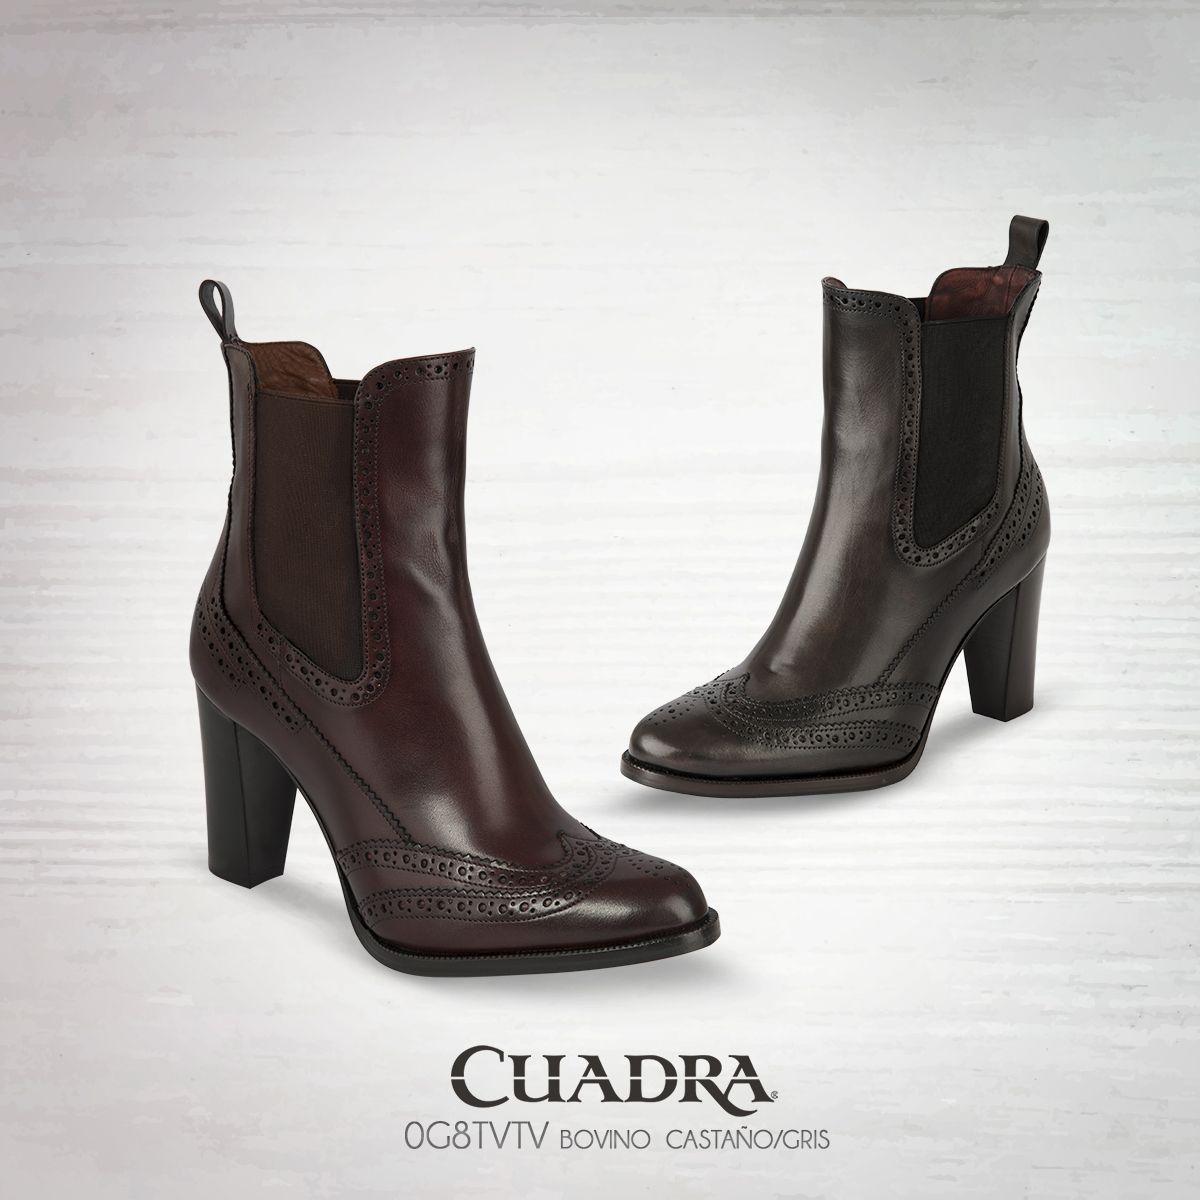 246faf17 Un moderno diseño con estilo clásico. #boots#leather#botines #dama#2016#2017#moda#fashion#streetstyle